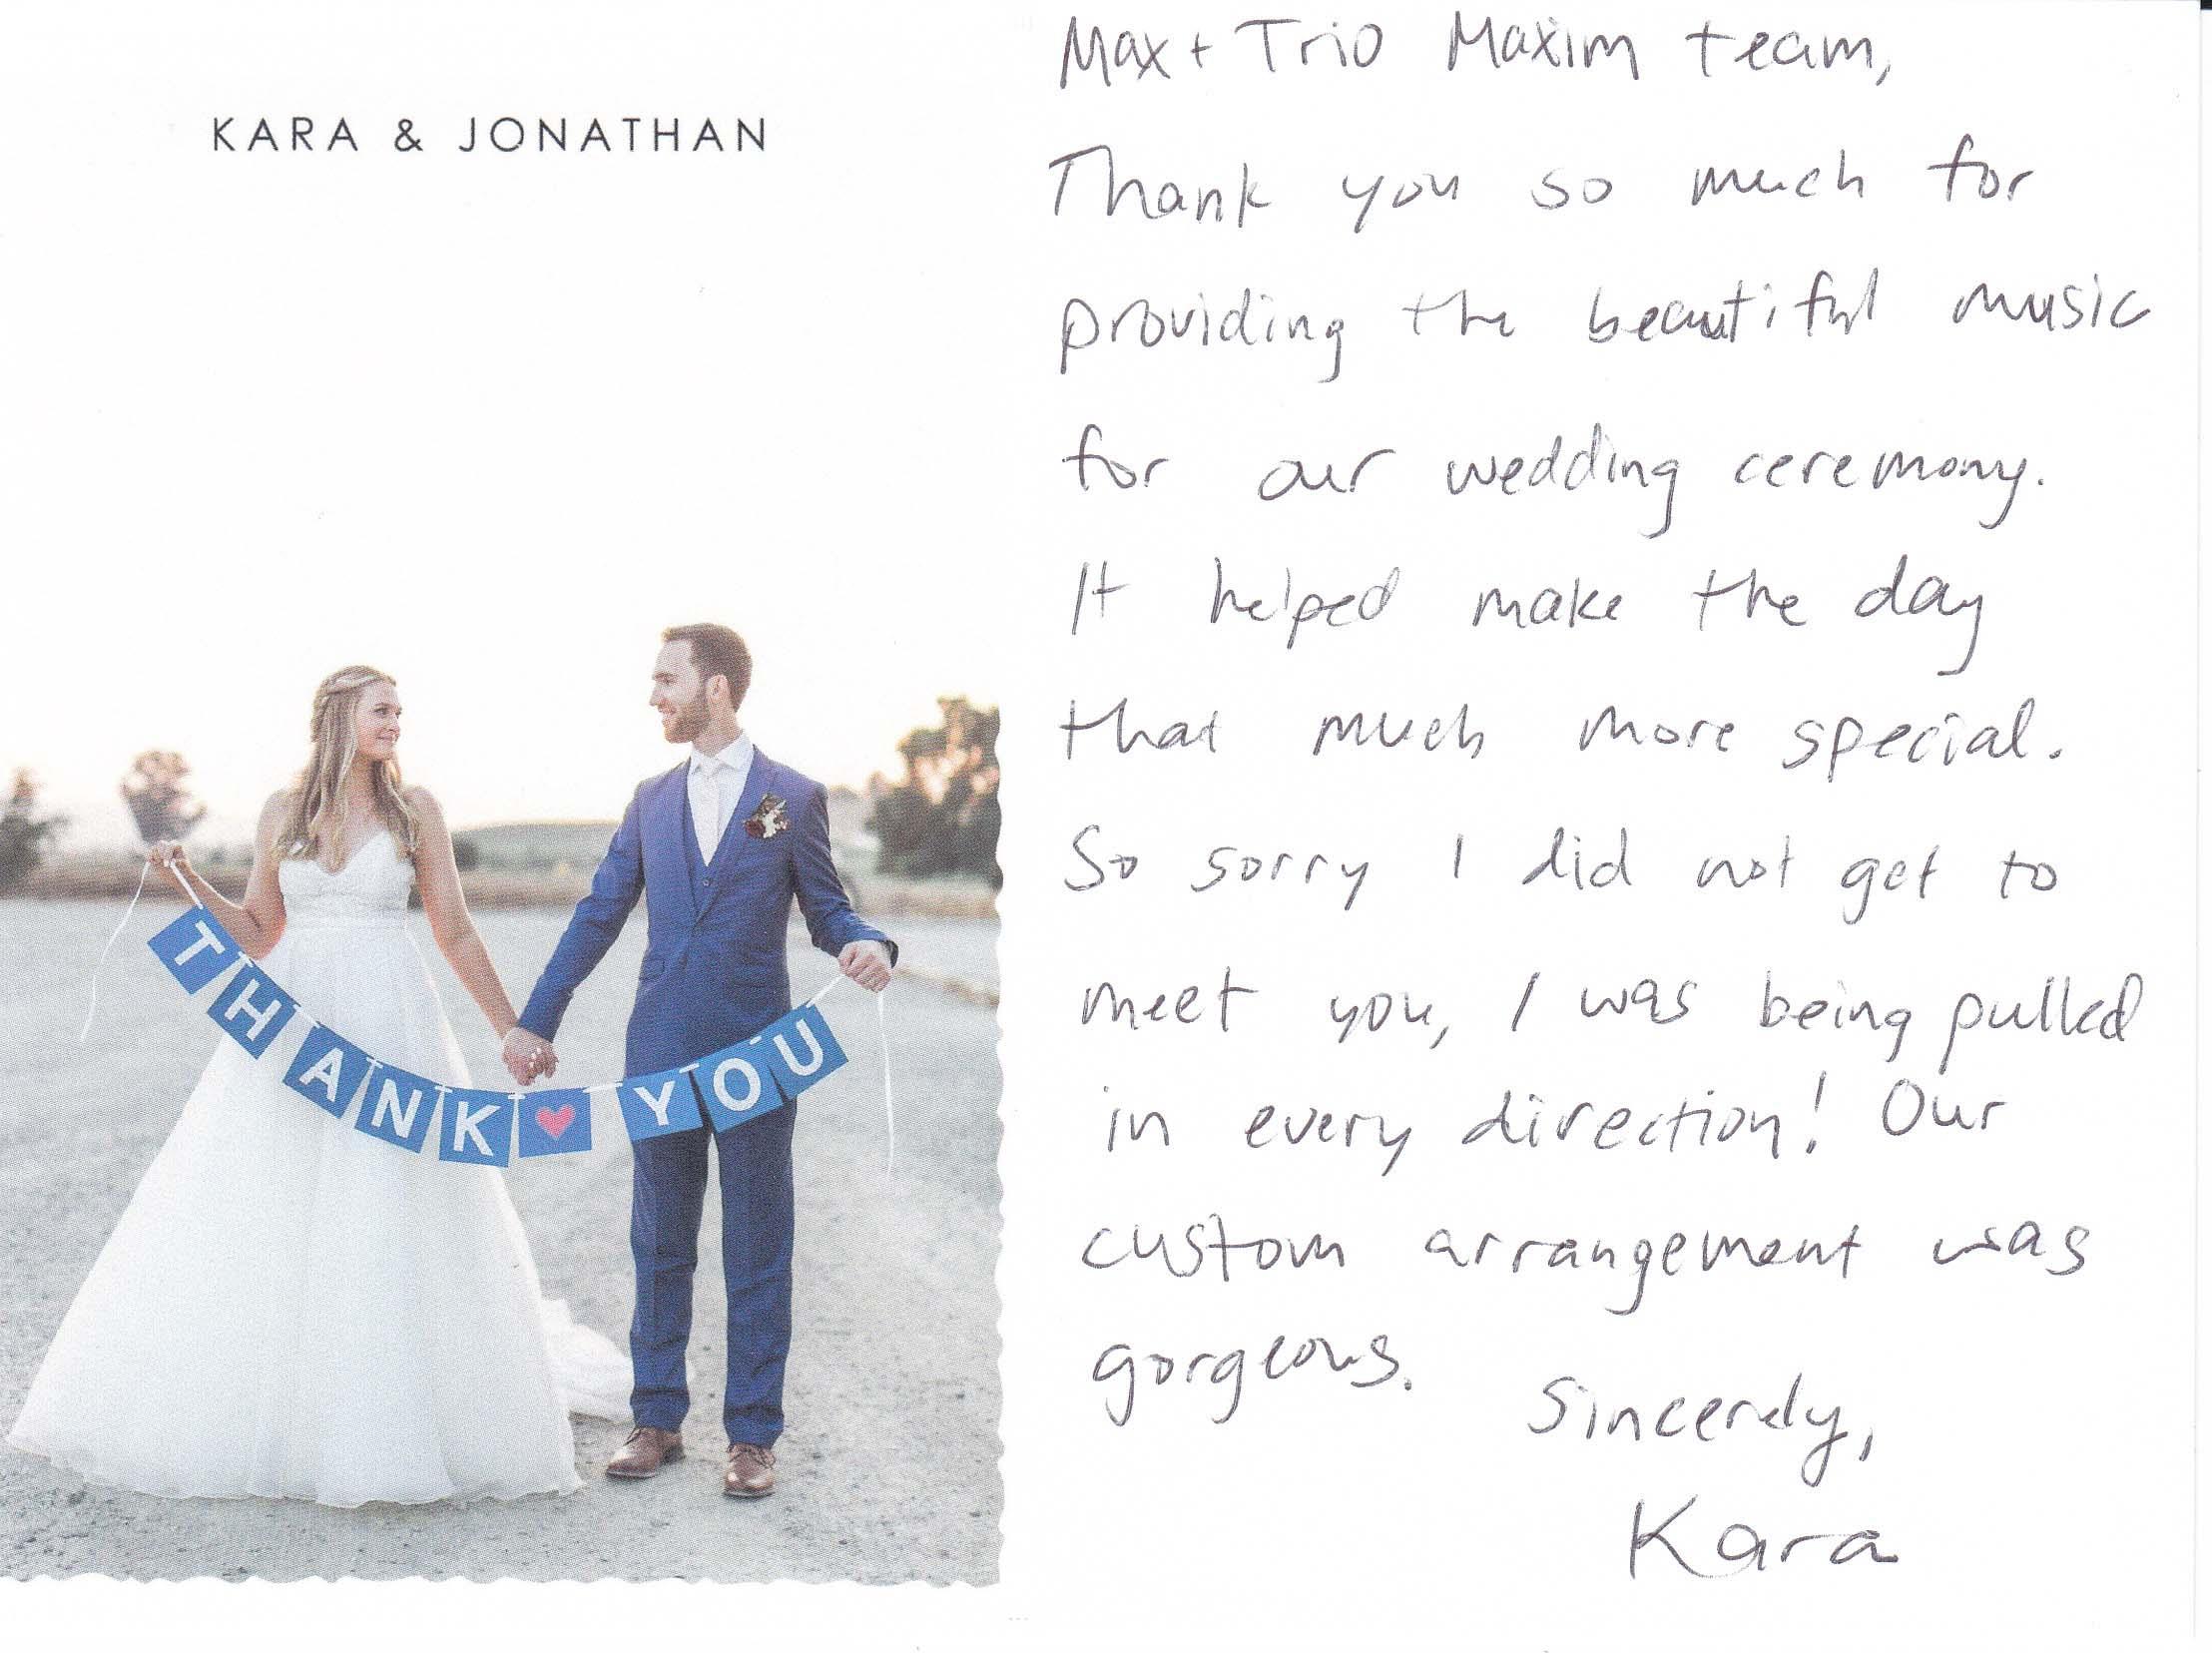 Kara & Jonathan